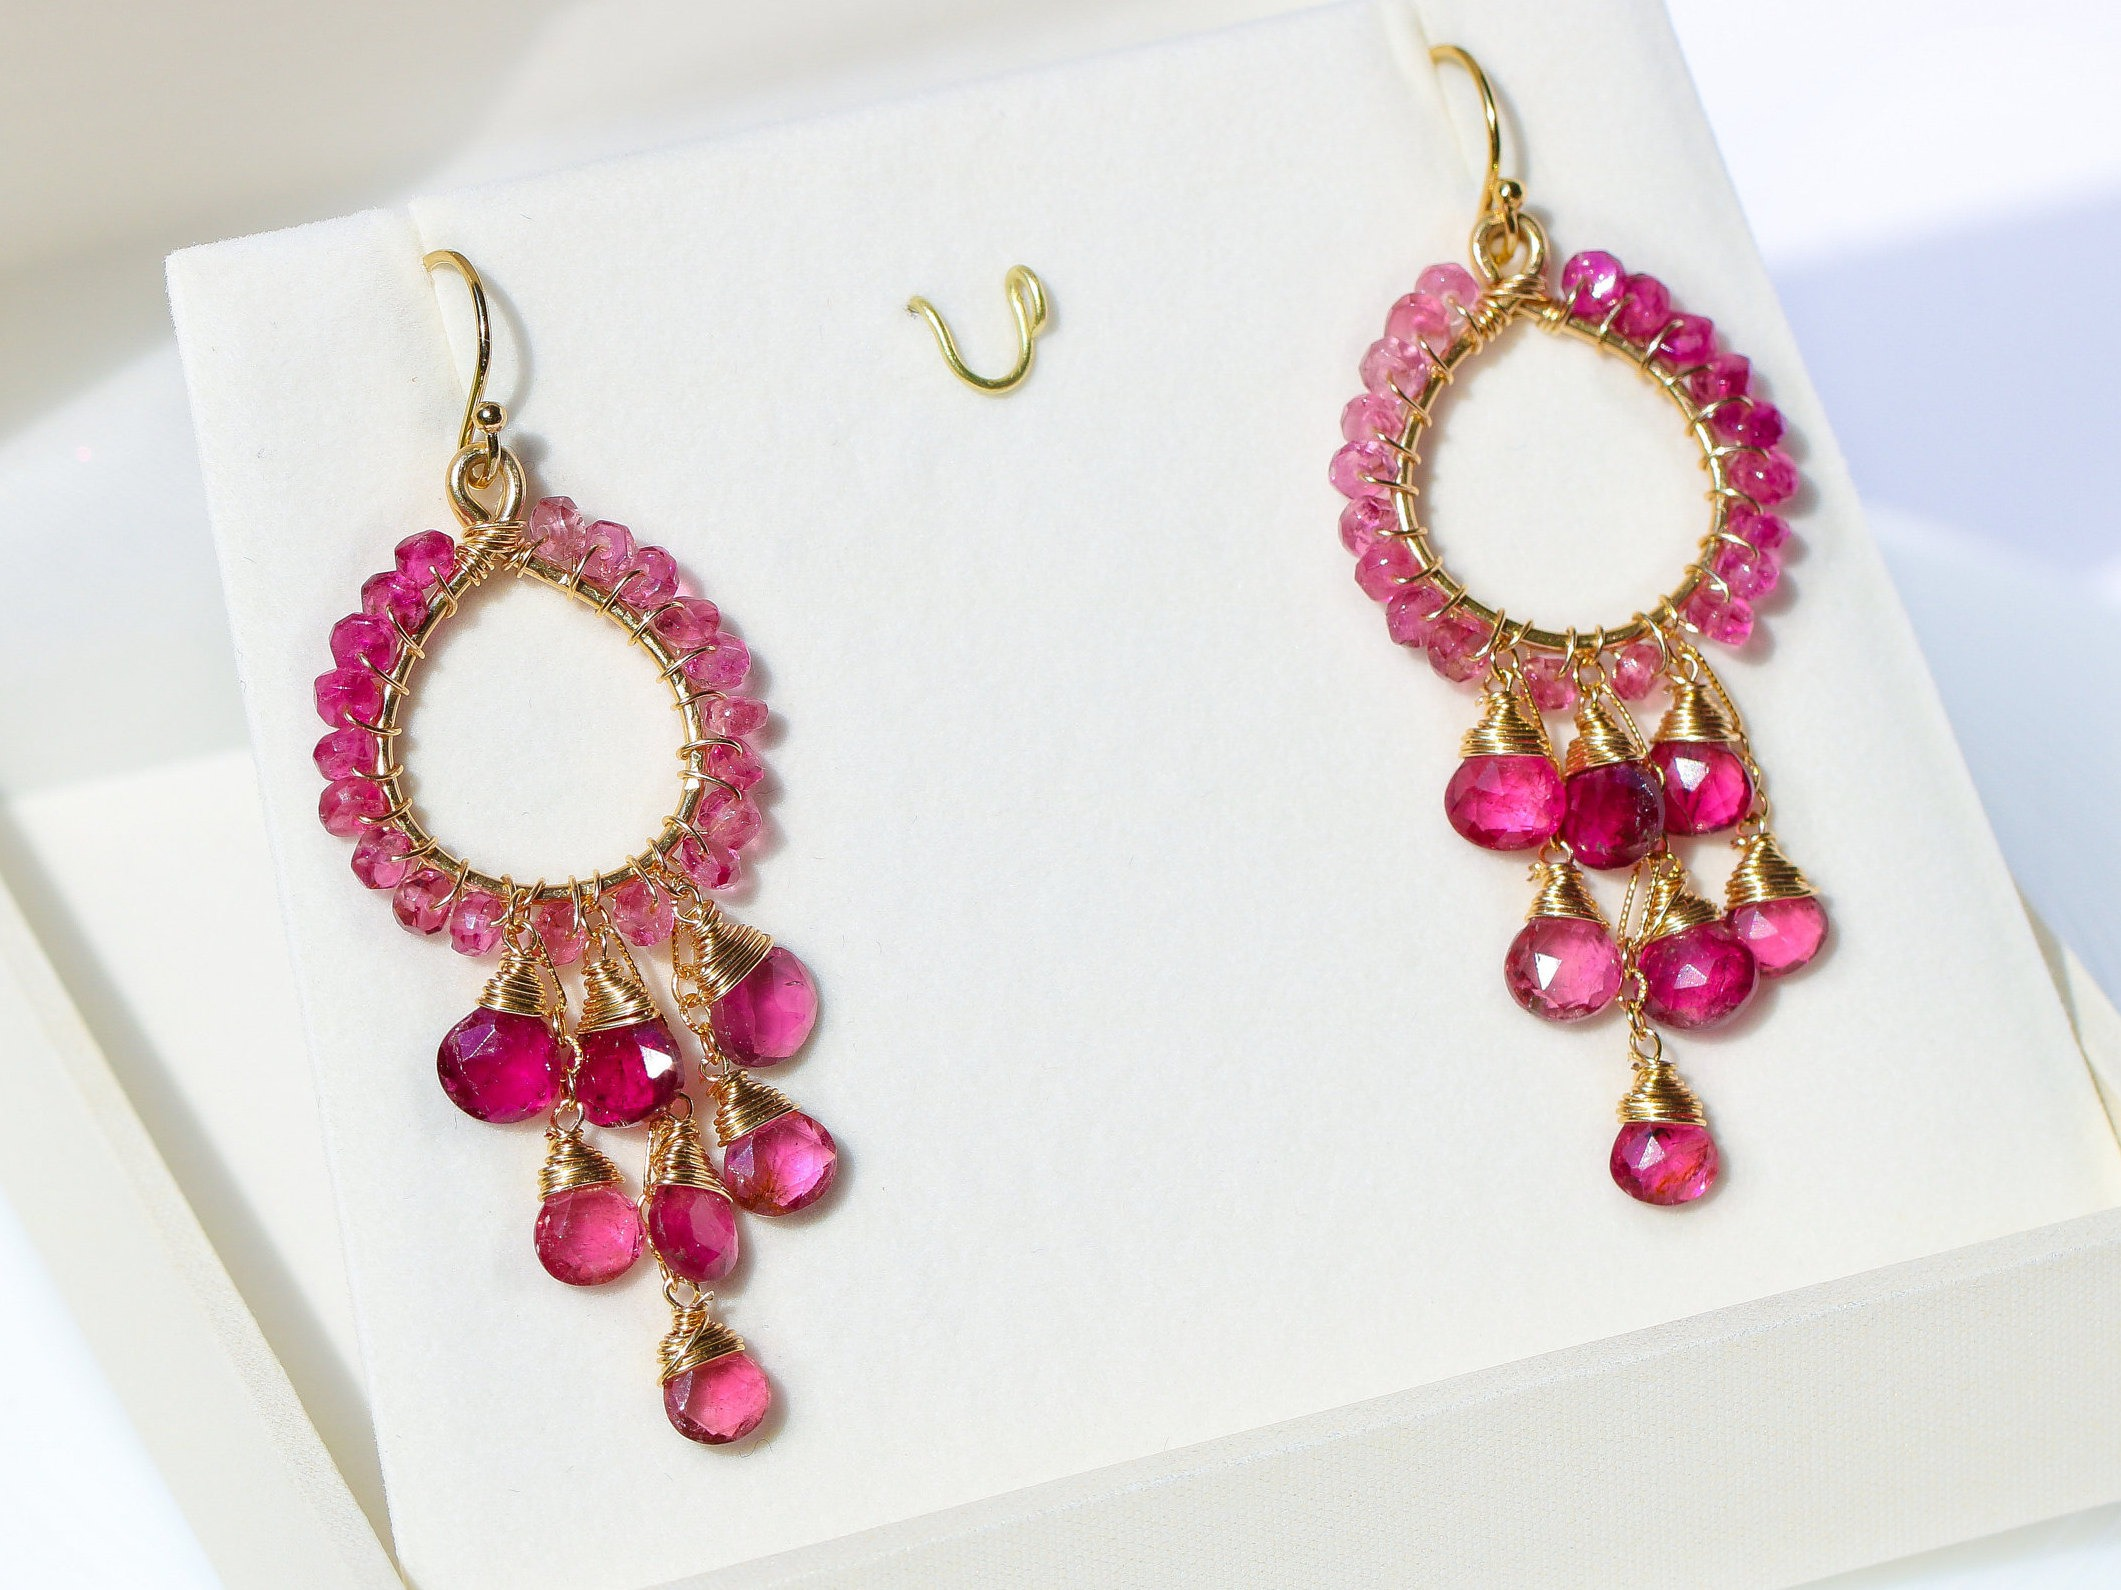 Rubellite Pink Tourmaline Chandelier Earrings in Gold Filled, Wire ...